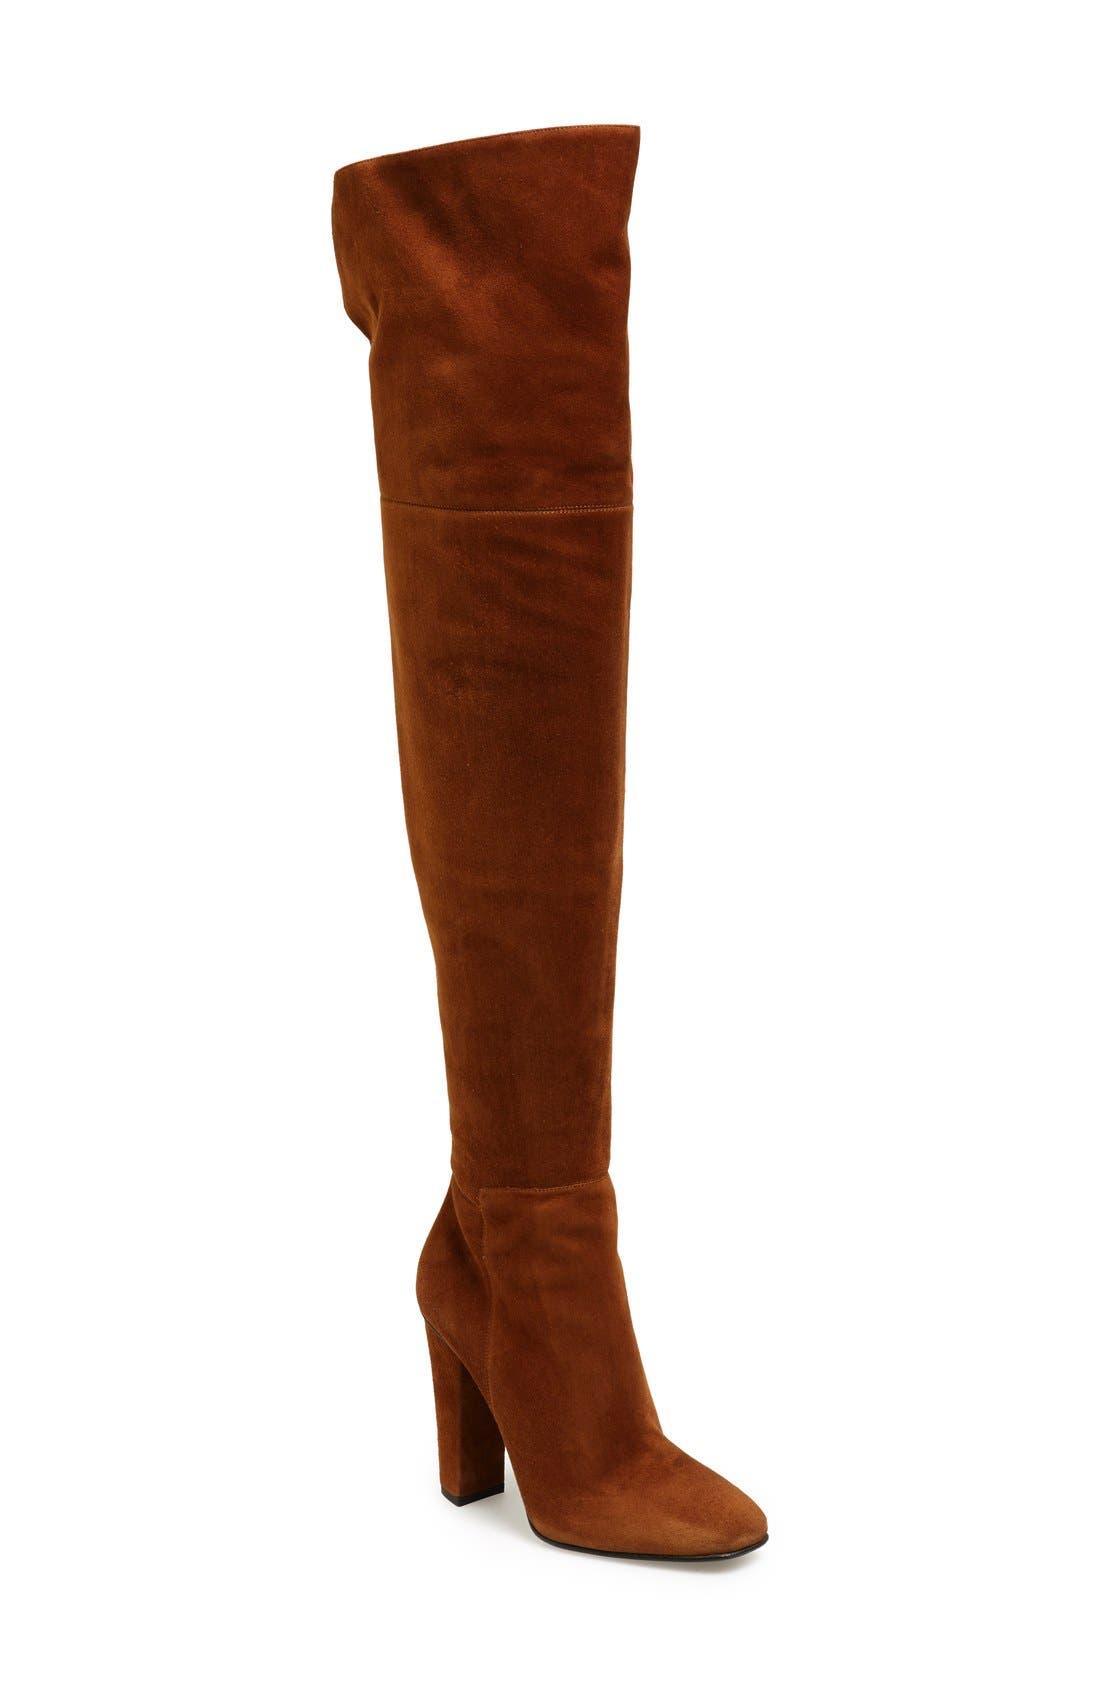 Alternate Image 1 Selected - Giuseppe Zanotti 'Alabama' Over the Knee Boot (Women)